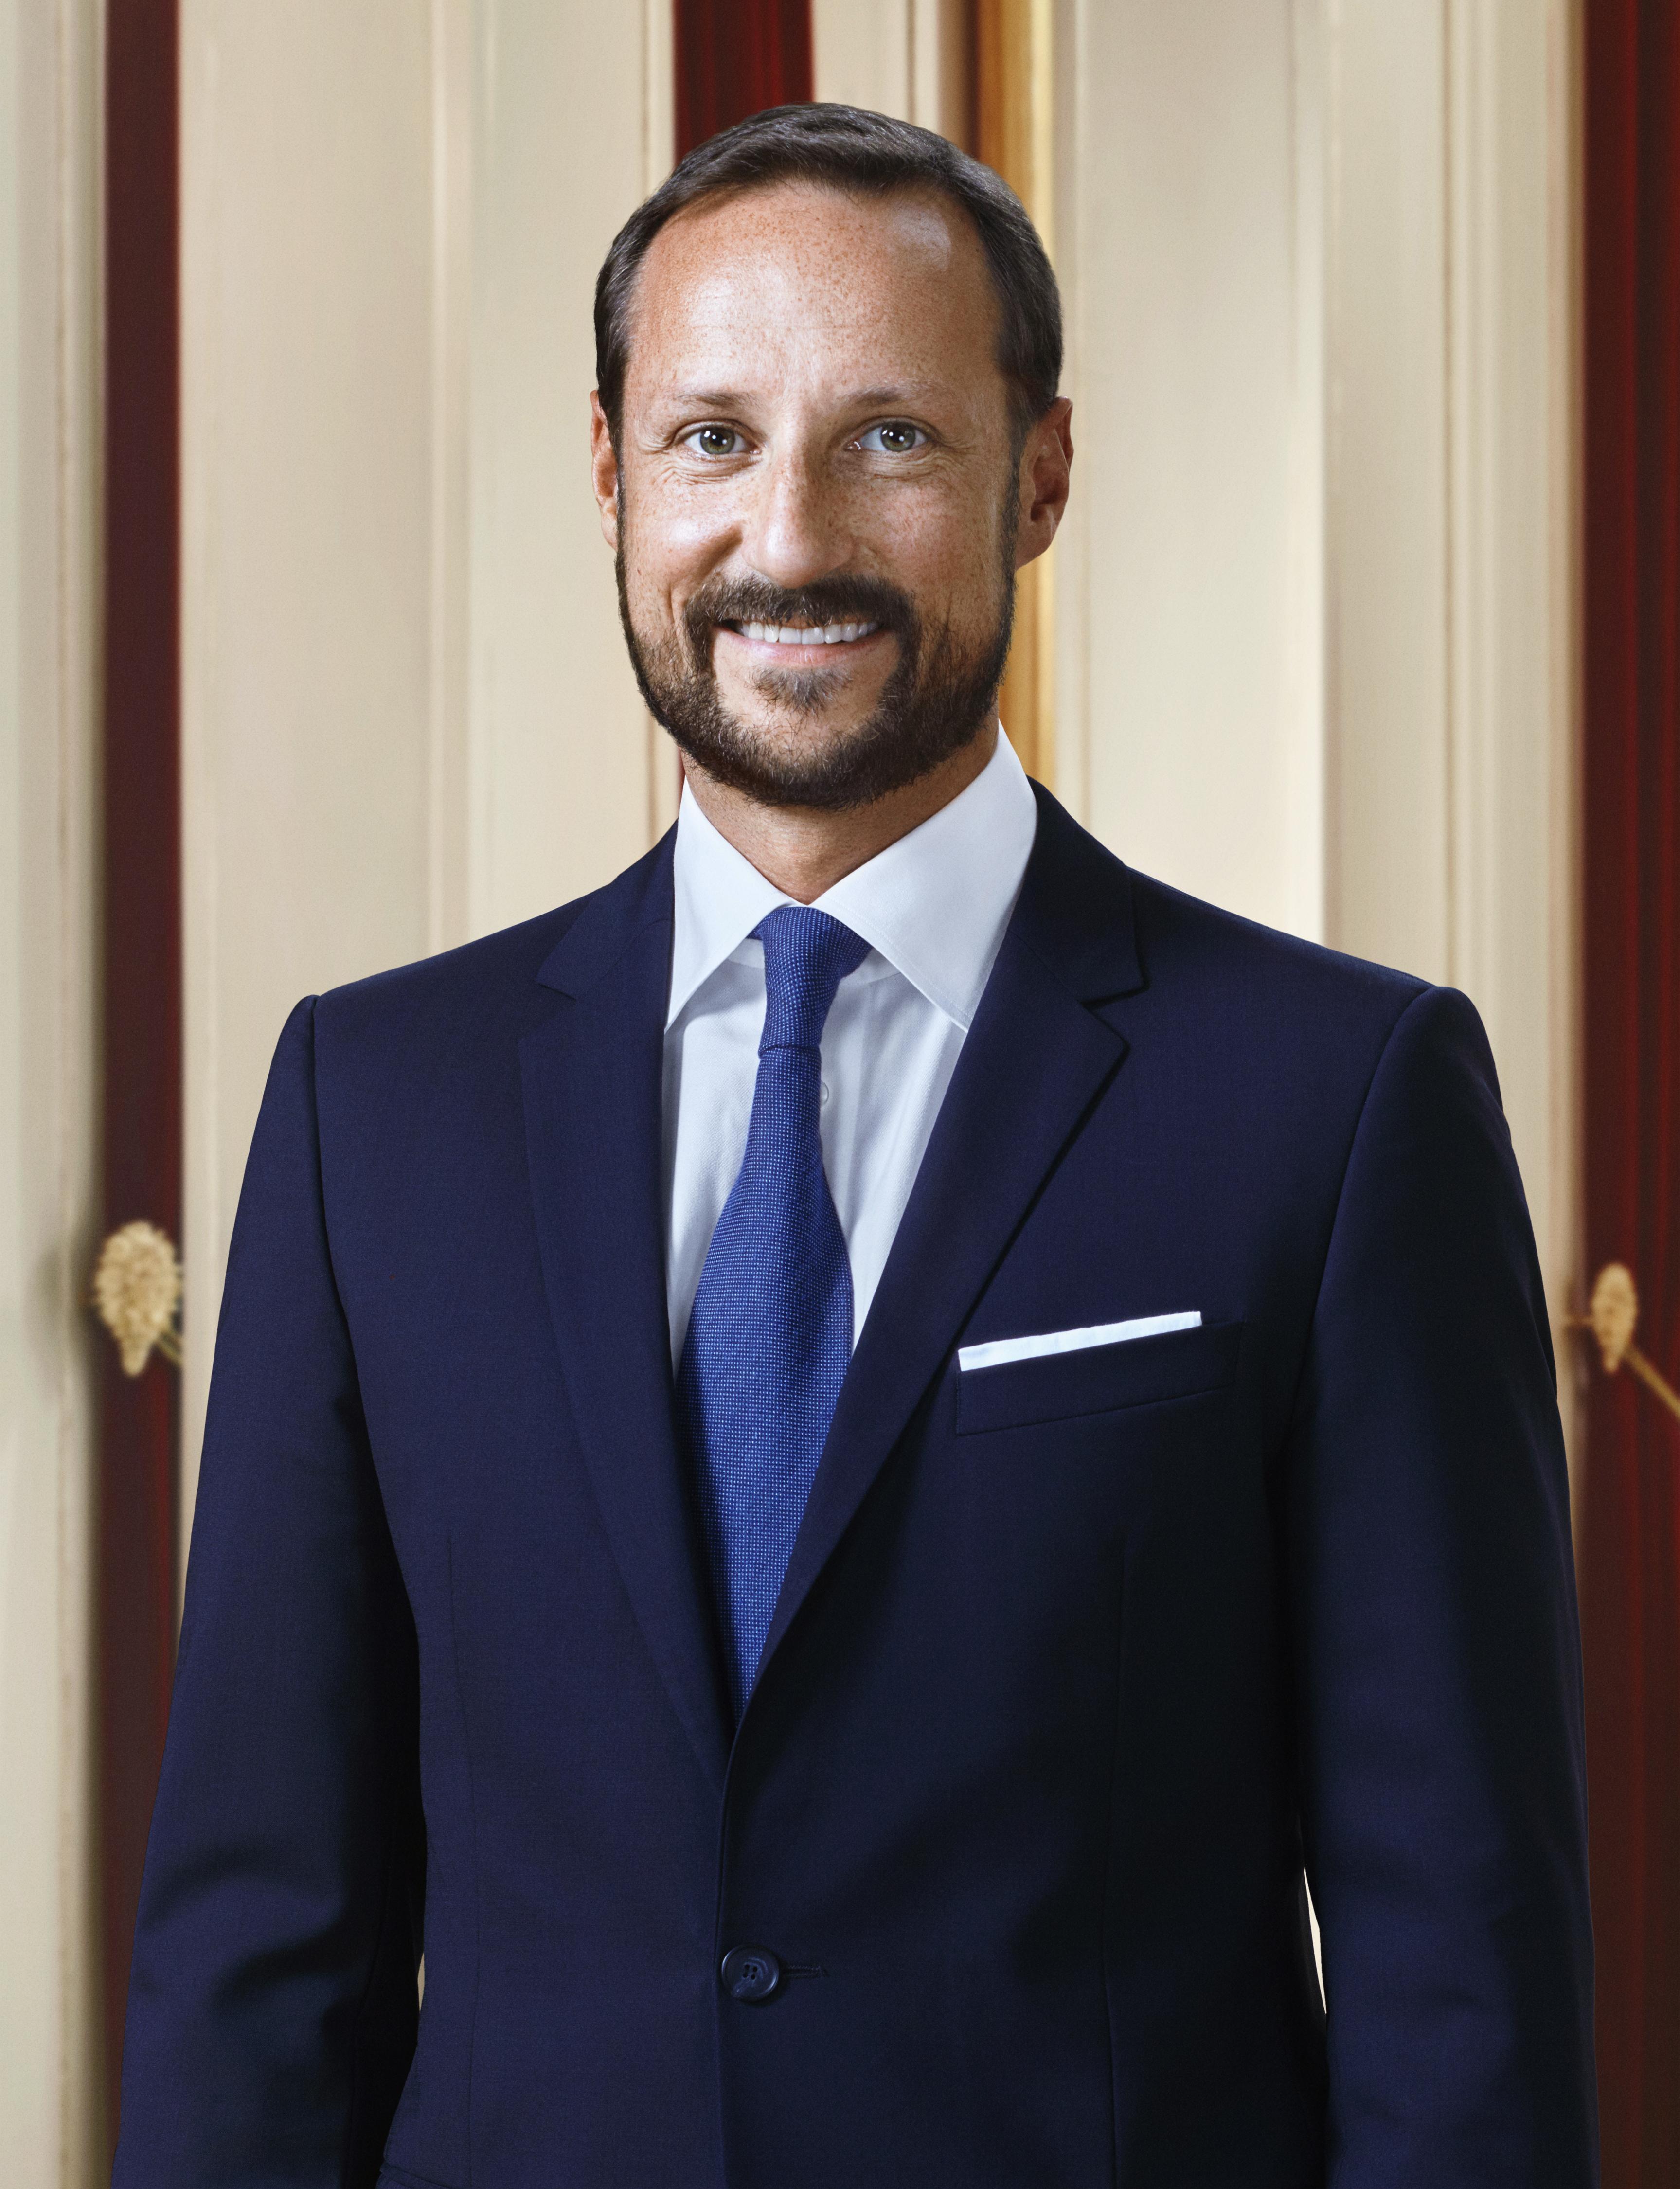 HRH Crown Prince Haakon